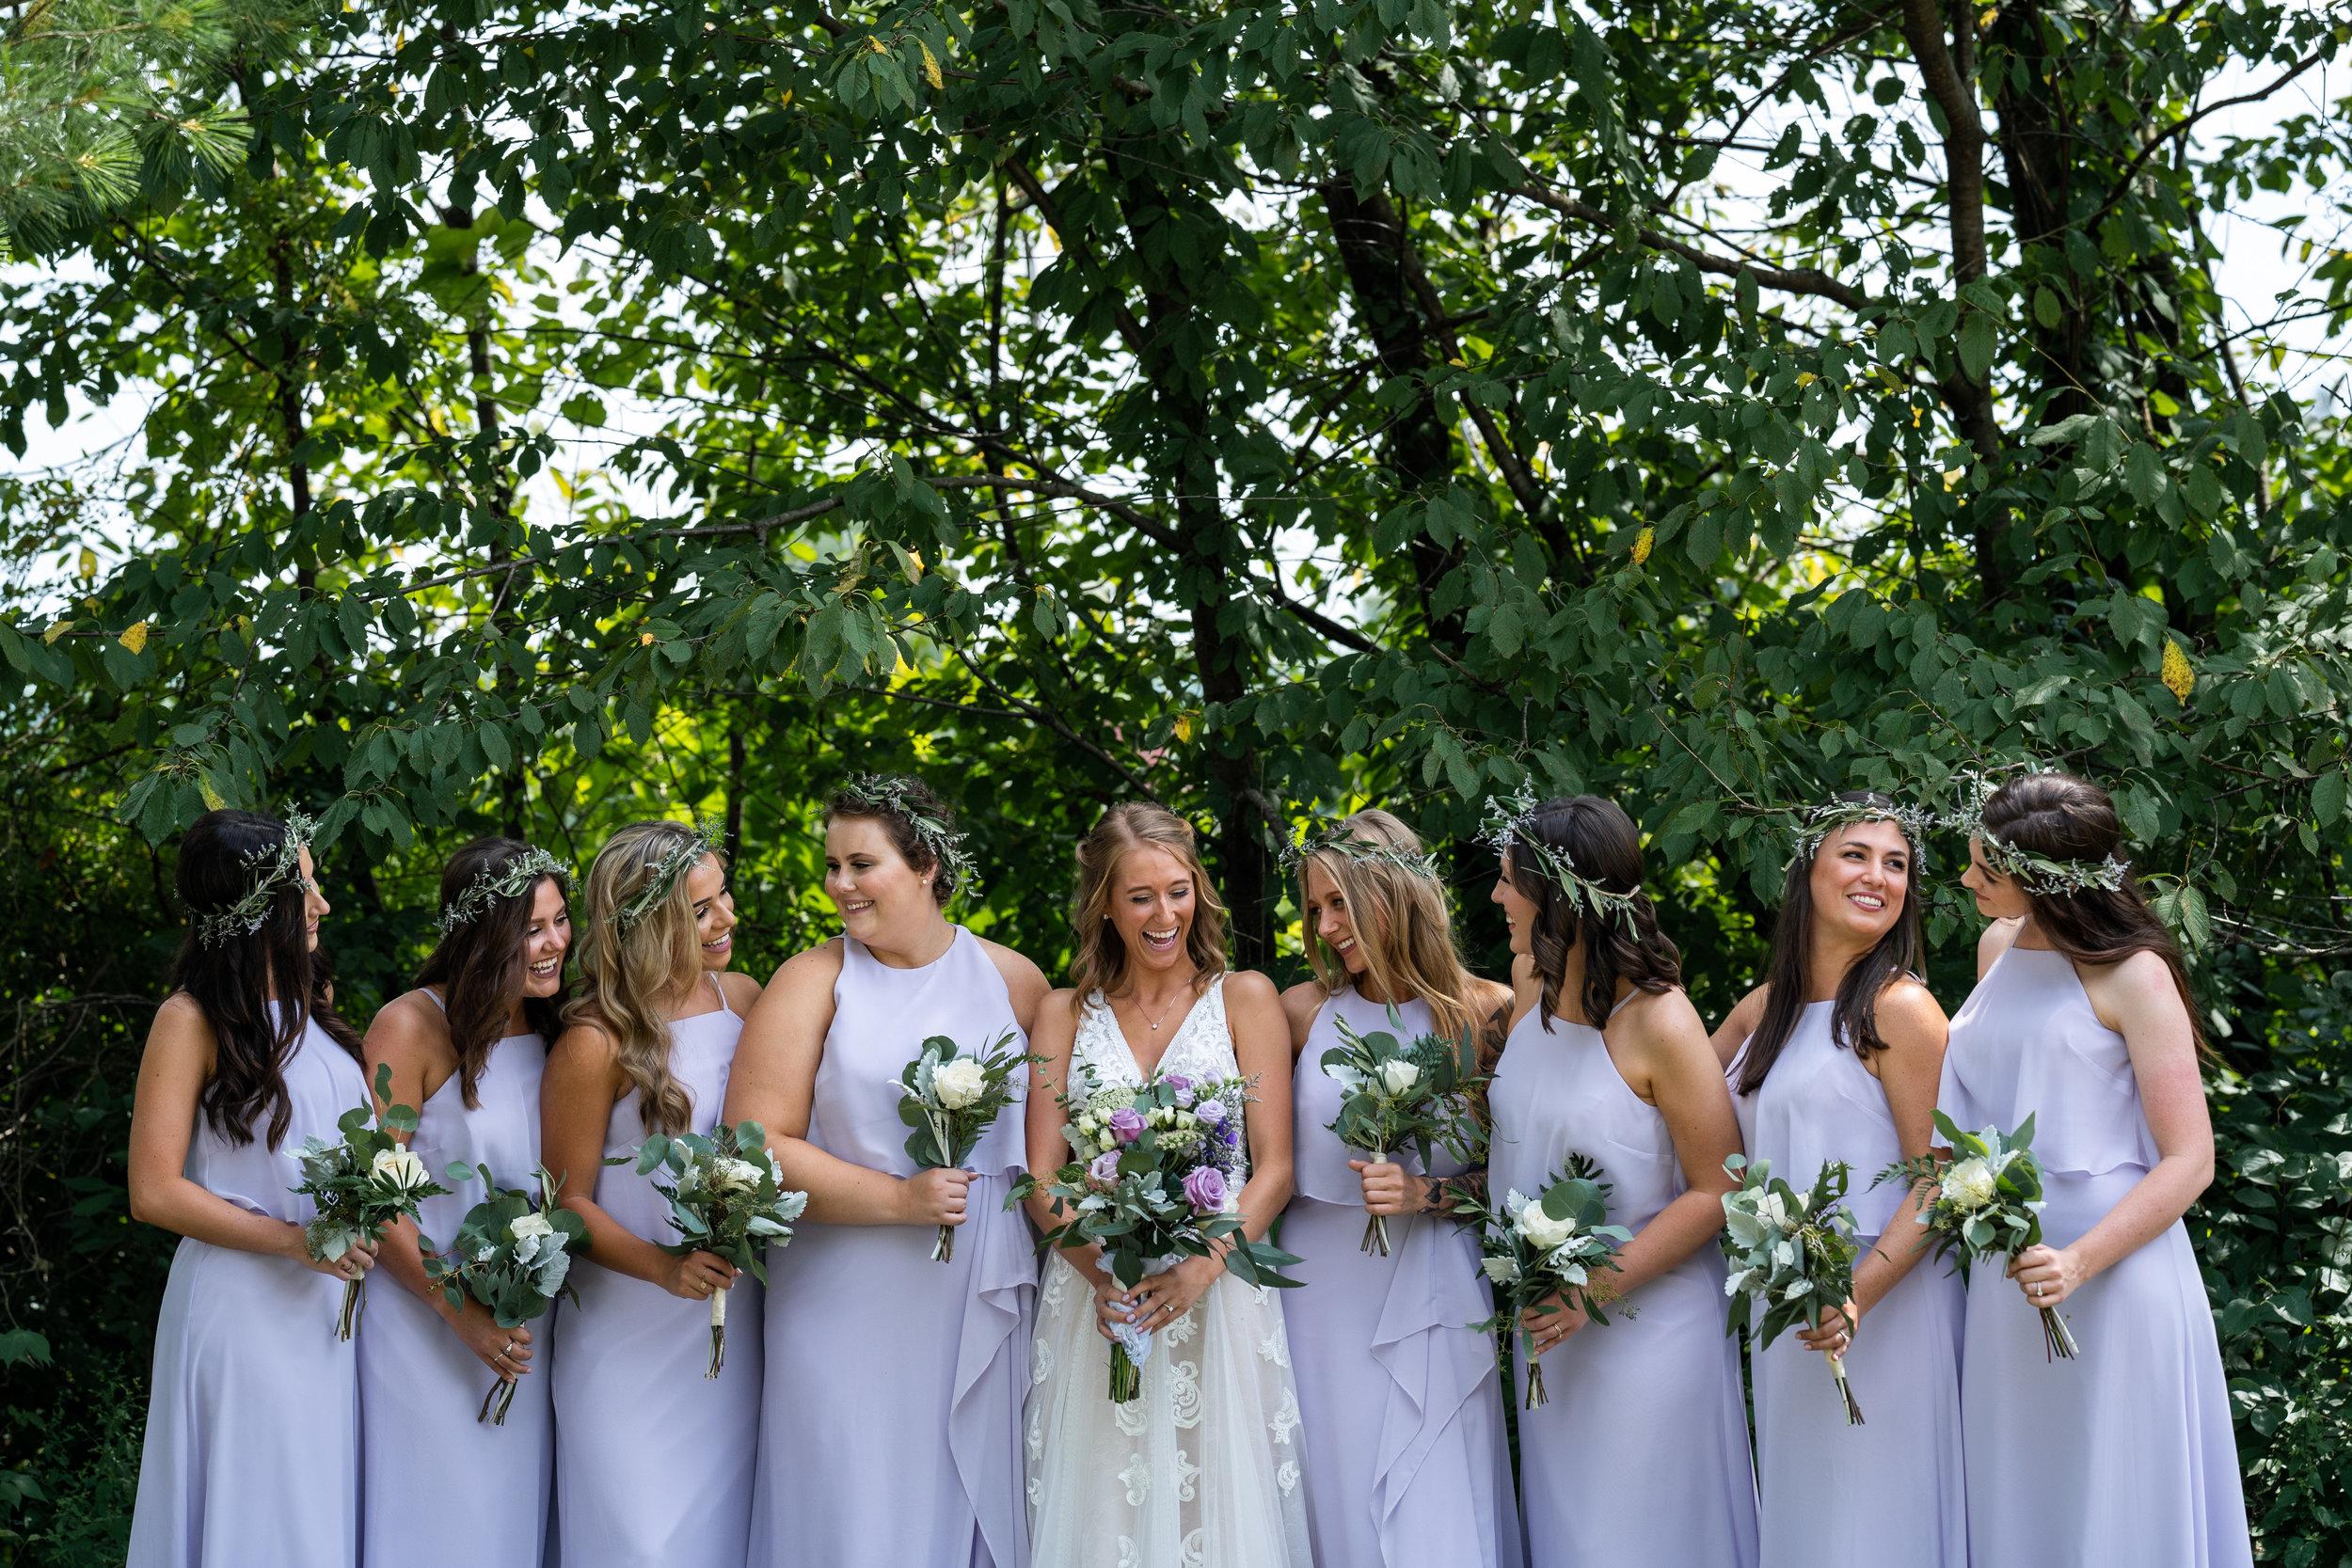 Bear Creative Co, Columbus Ohio Photographer, Columbus Ohio Wedding Photographer, Autumn Lakes, Sunbury OH, Campground Wedding, Columbus Ohio, Destination Photographer